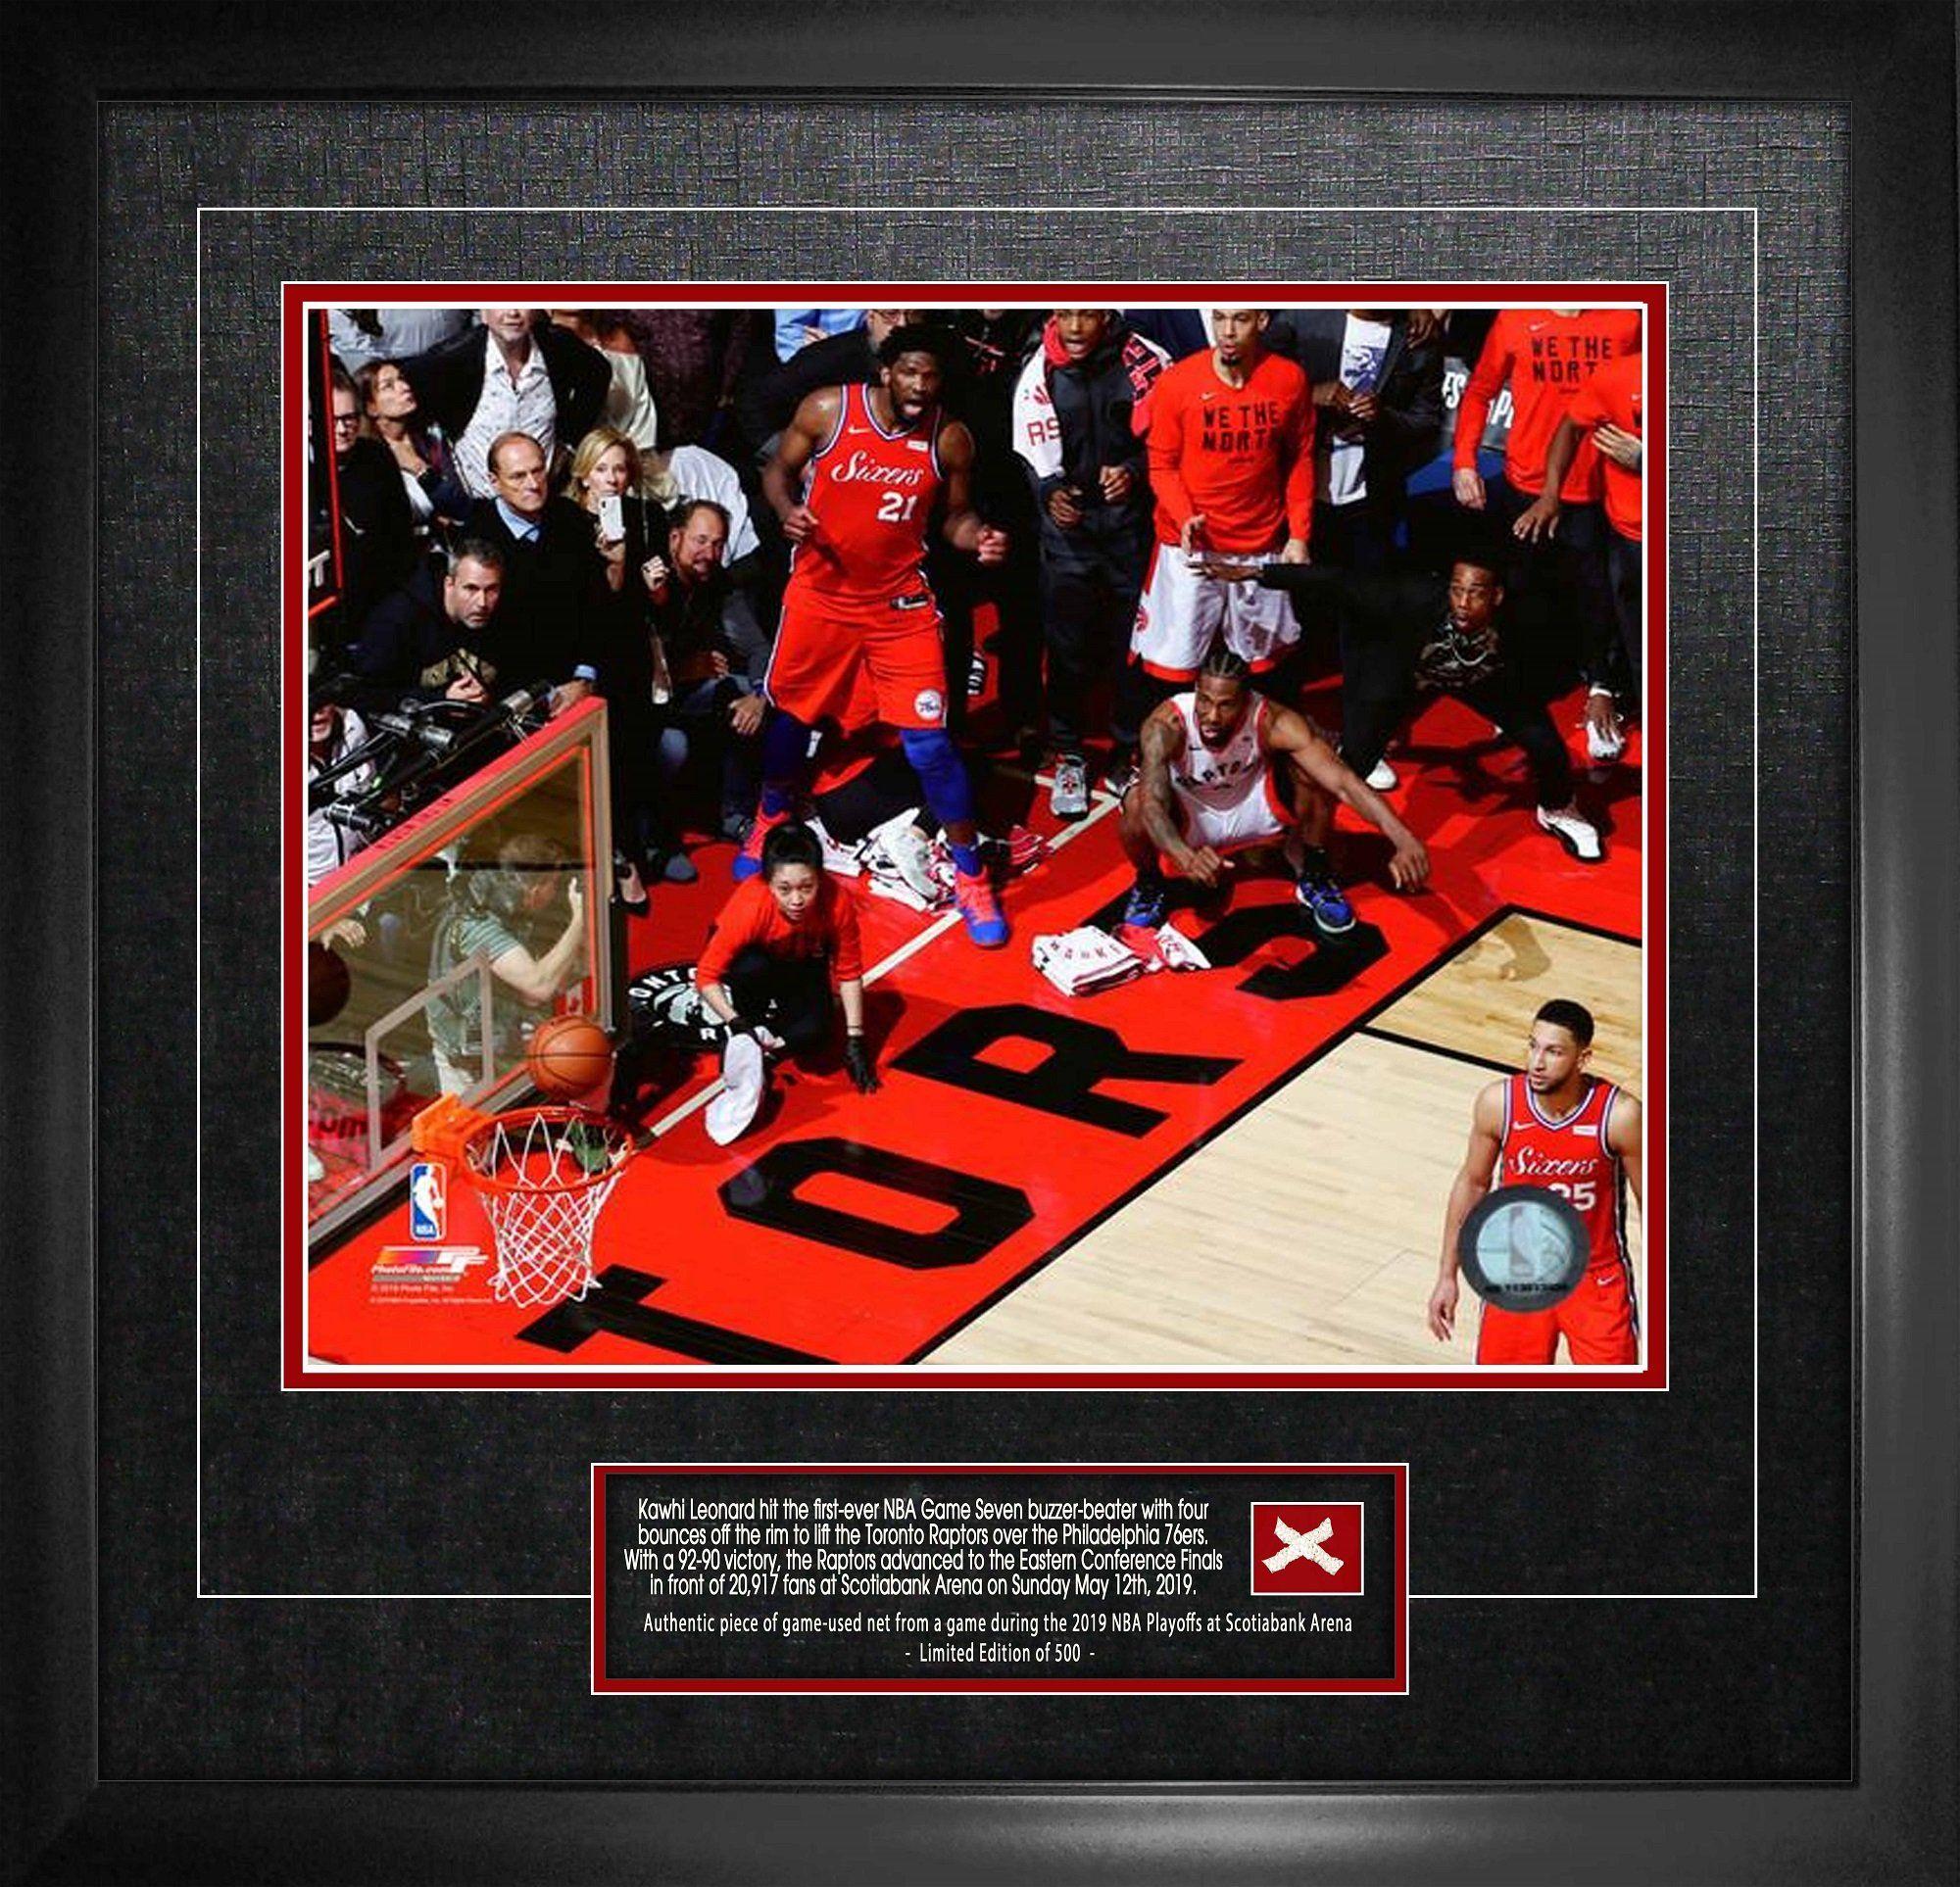 Toronto Raptors Kawhi Leonard Game 7 Buzzer Beater Shot Unsigned Picture 16x20